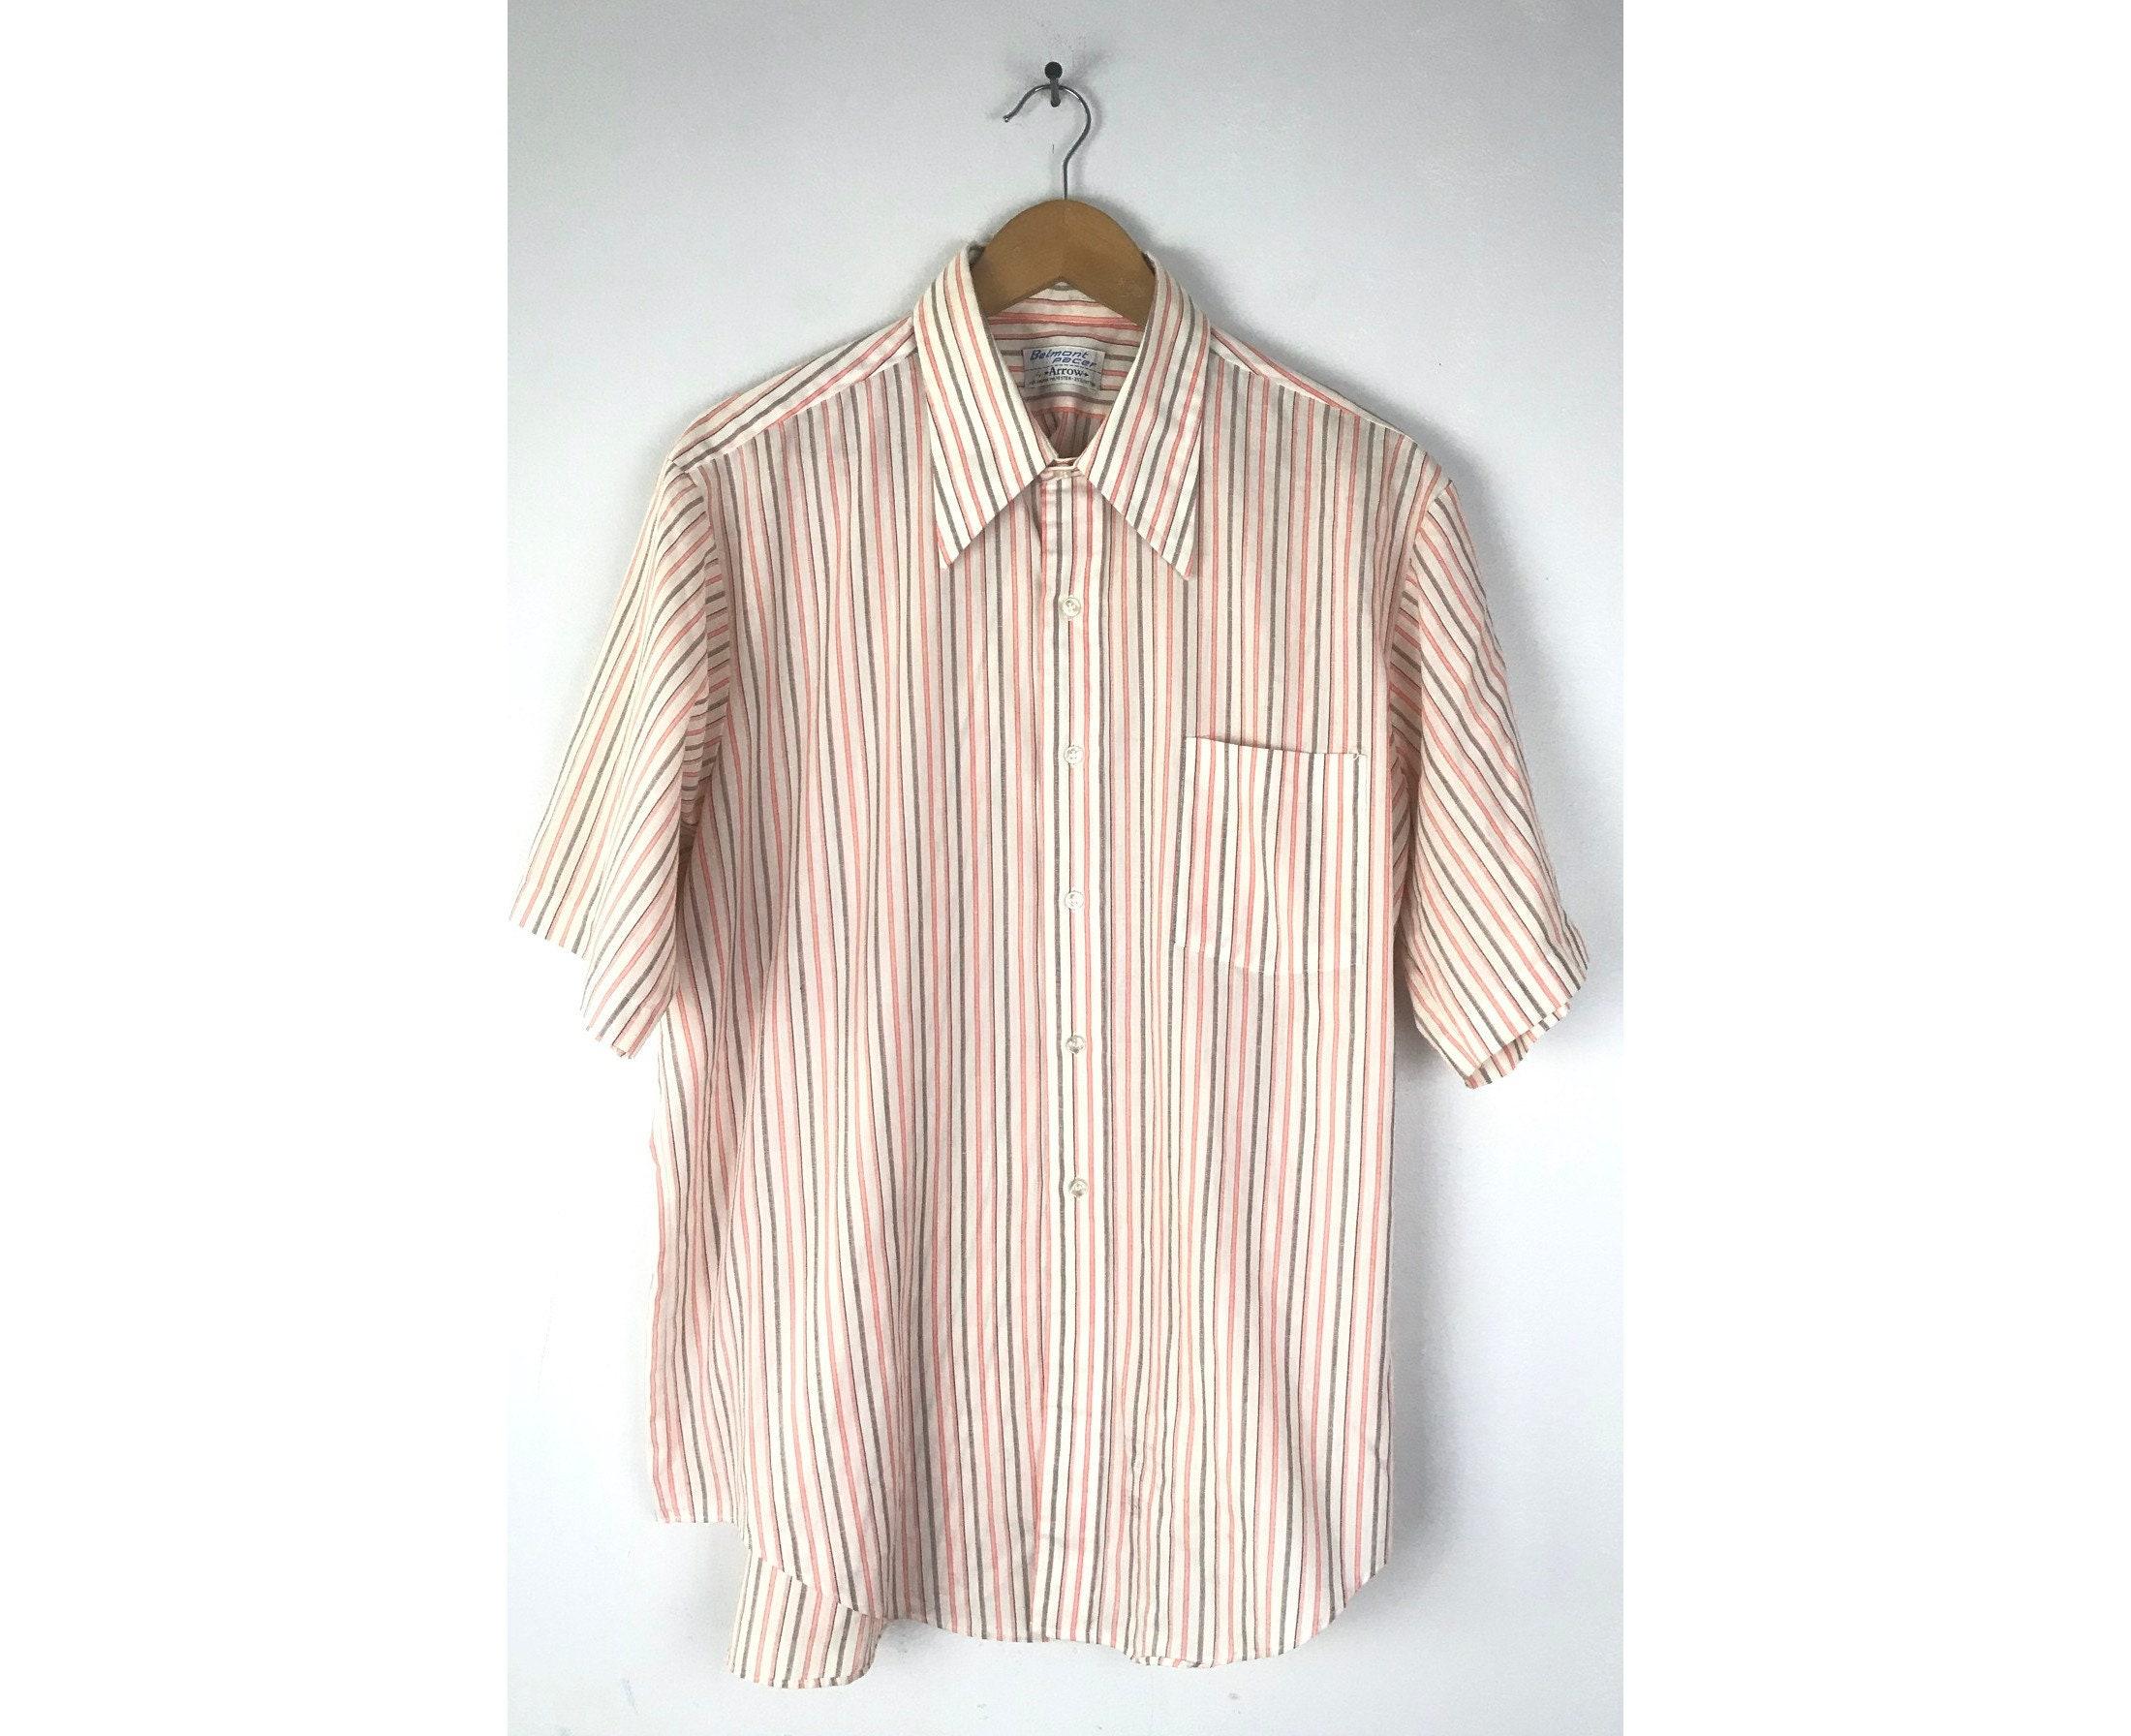 1960s – 70s Men's Ties | Skinny Ties, Slim Ties 60S Arrow Orange Black  White Striped Shirt Mens Size Xl 17, Vintage Short Sleeve Button Down Shirt, 1960S Retro Preppy $26.00 AT vintagedancer.com